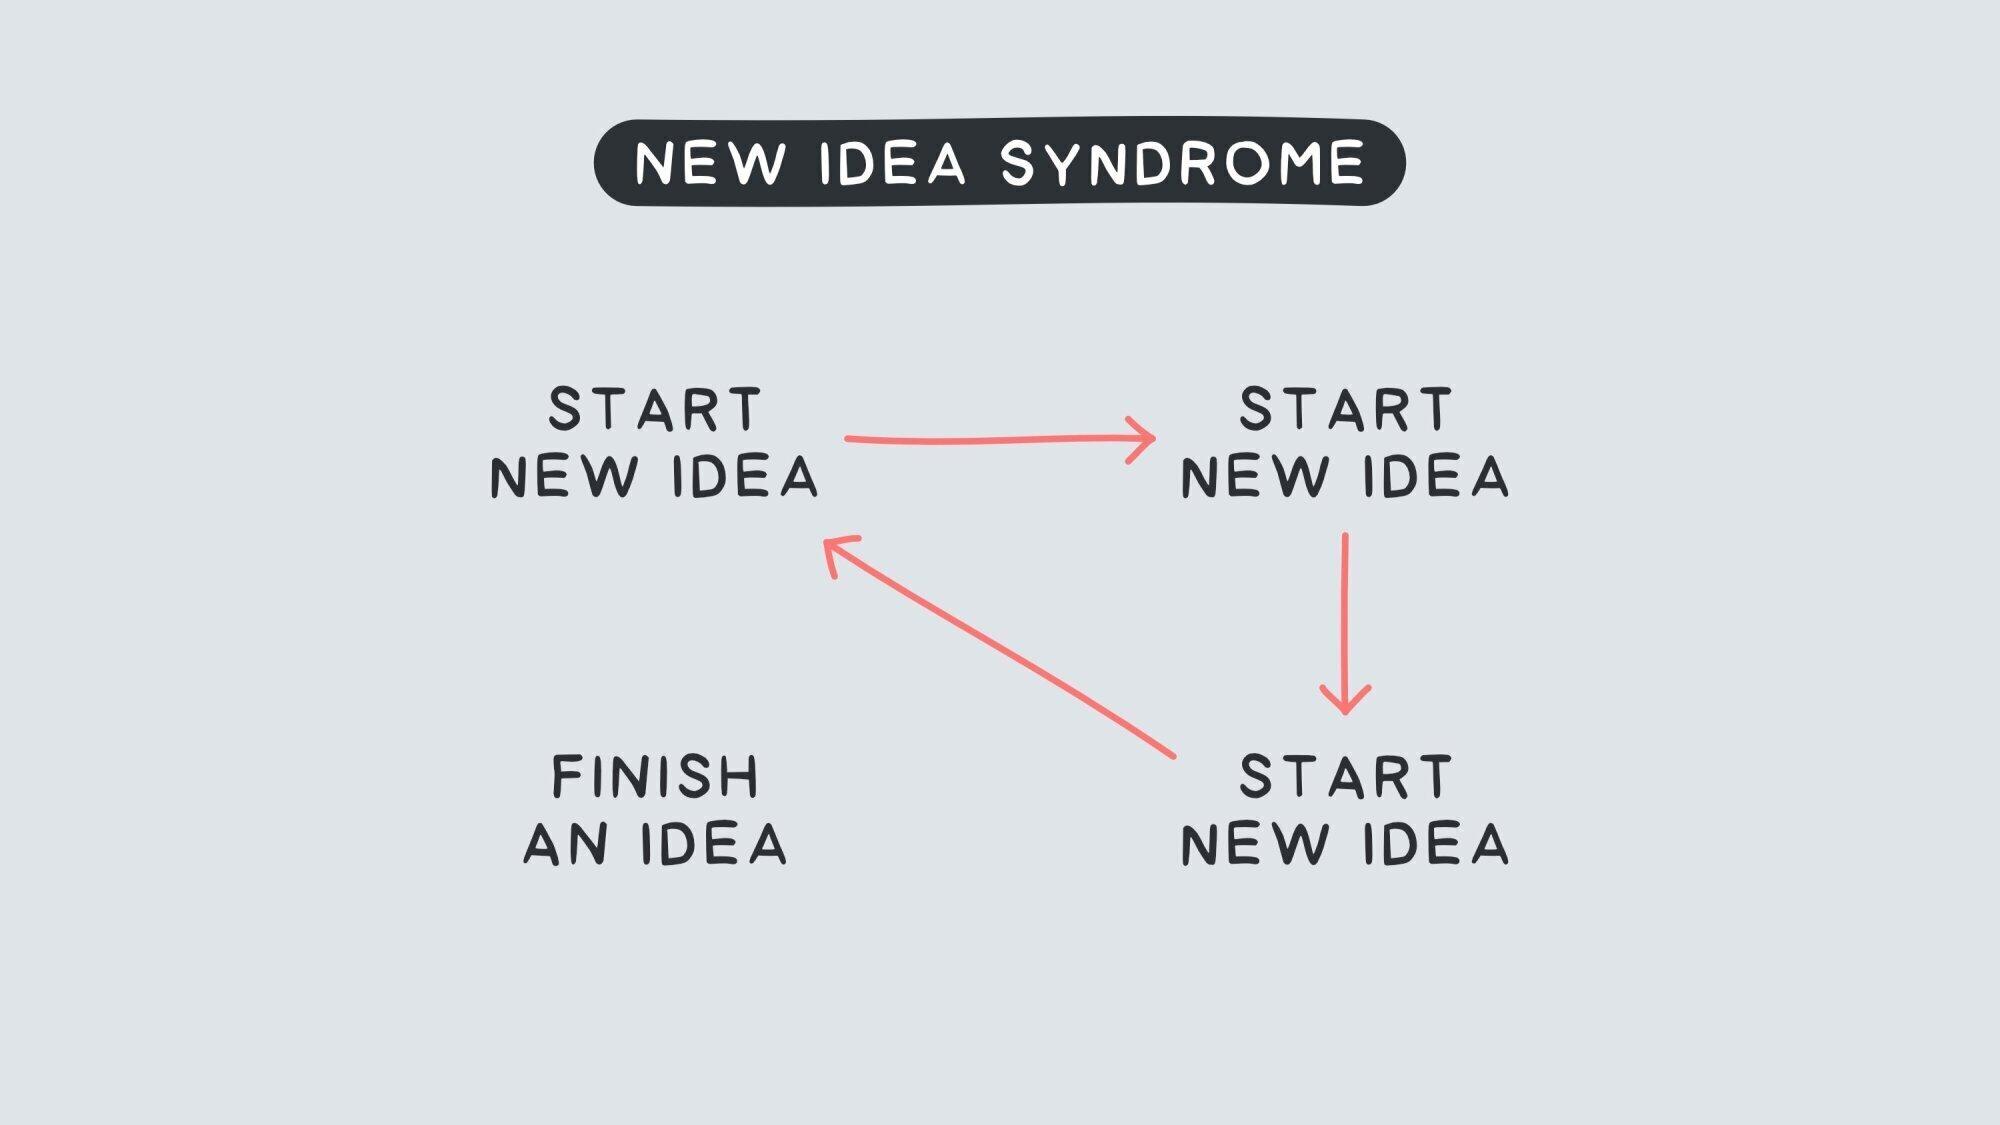 9f7fccaa-9a20-11ea-a3d0-06b4694bee2a%2F1627505268639-New+idea+syndrome.jpg